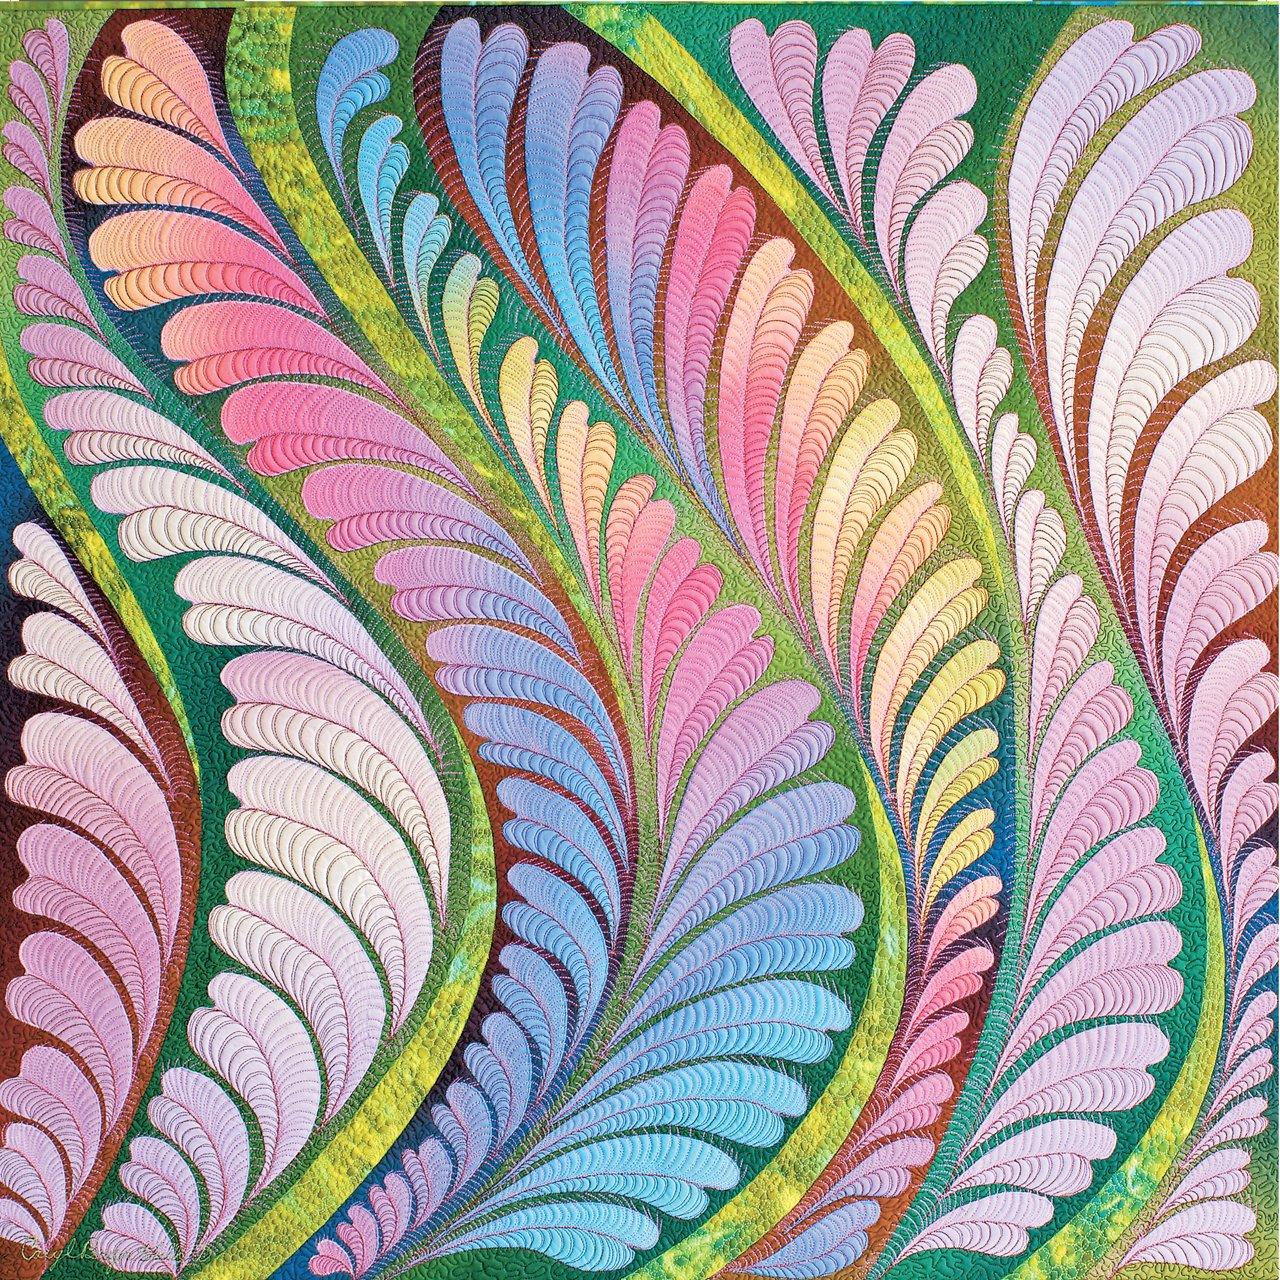 Award Winning Quilts 2014 Calendar: Featuring Quilts from the International  Quilt Association: That Patchwork Place: 9781604683318: Amazon.com: Books